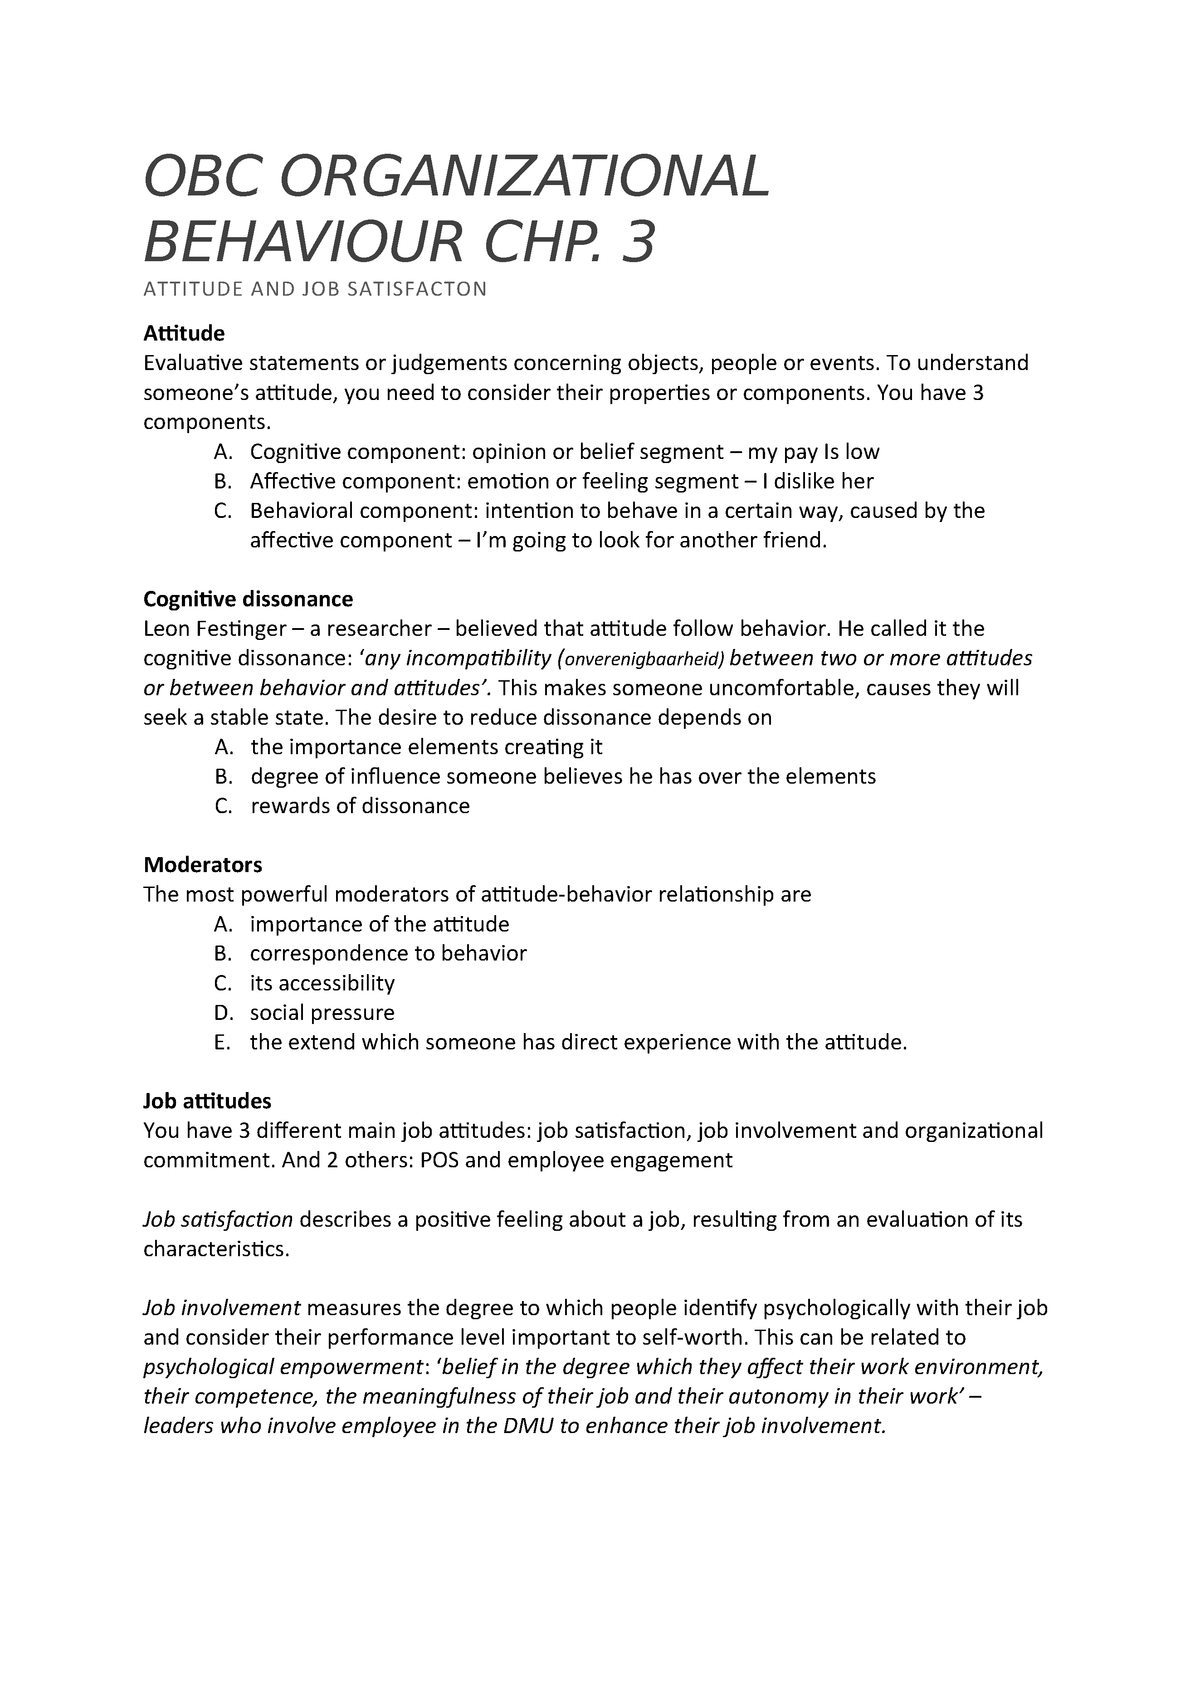 OBC Organizational Behaviour CHP - MPEN-OBC-14 - StuDocu